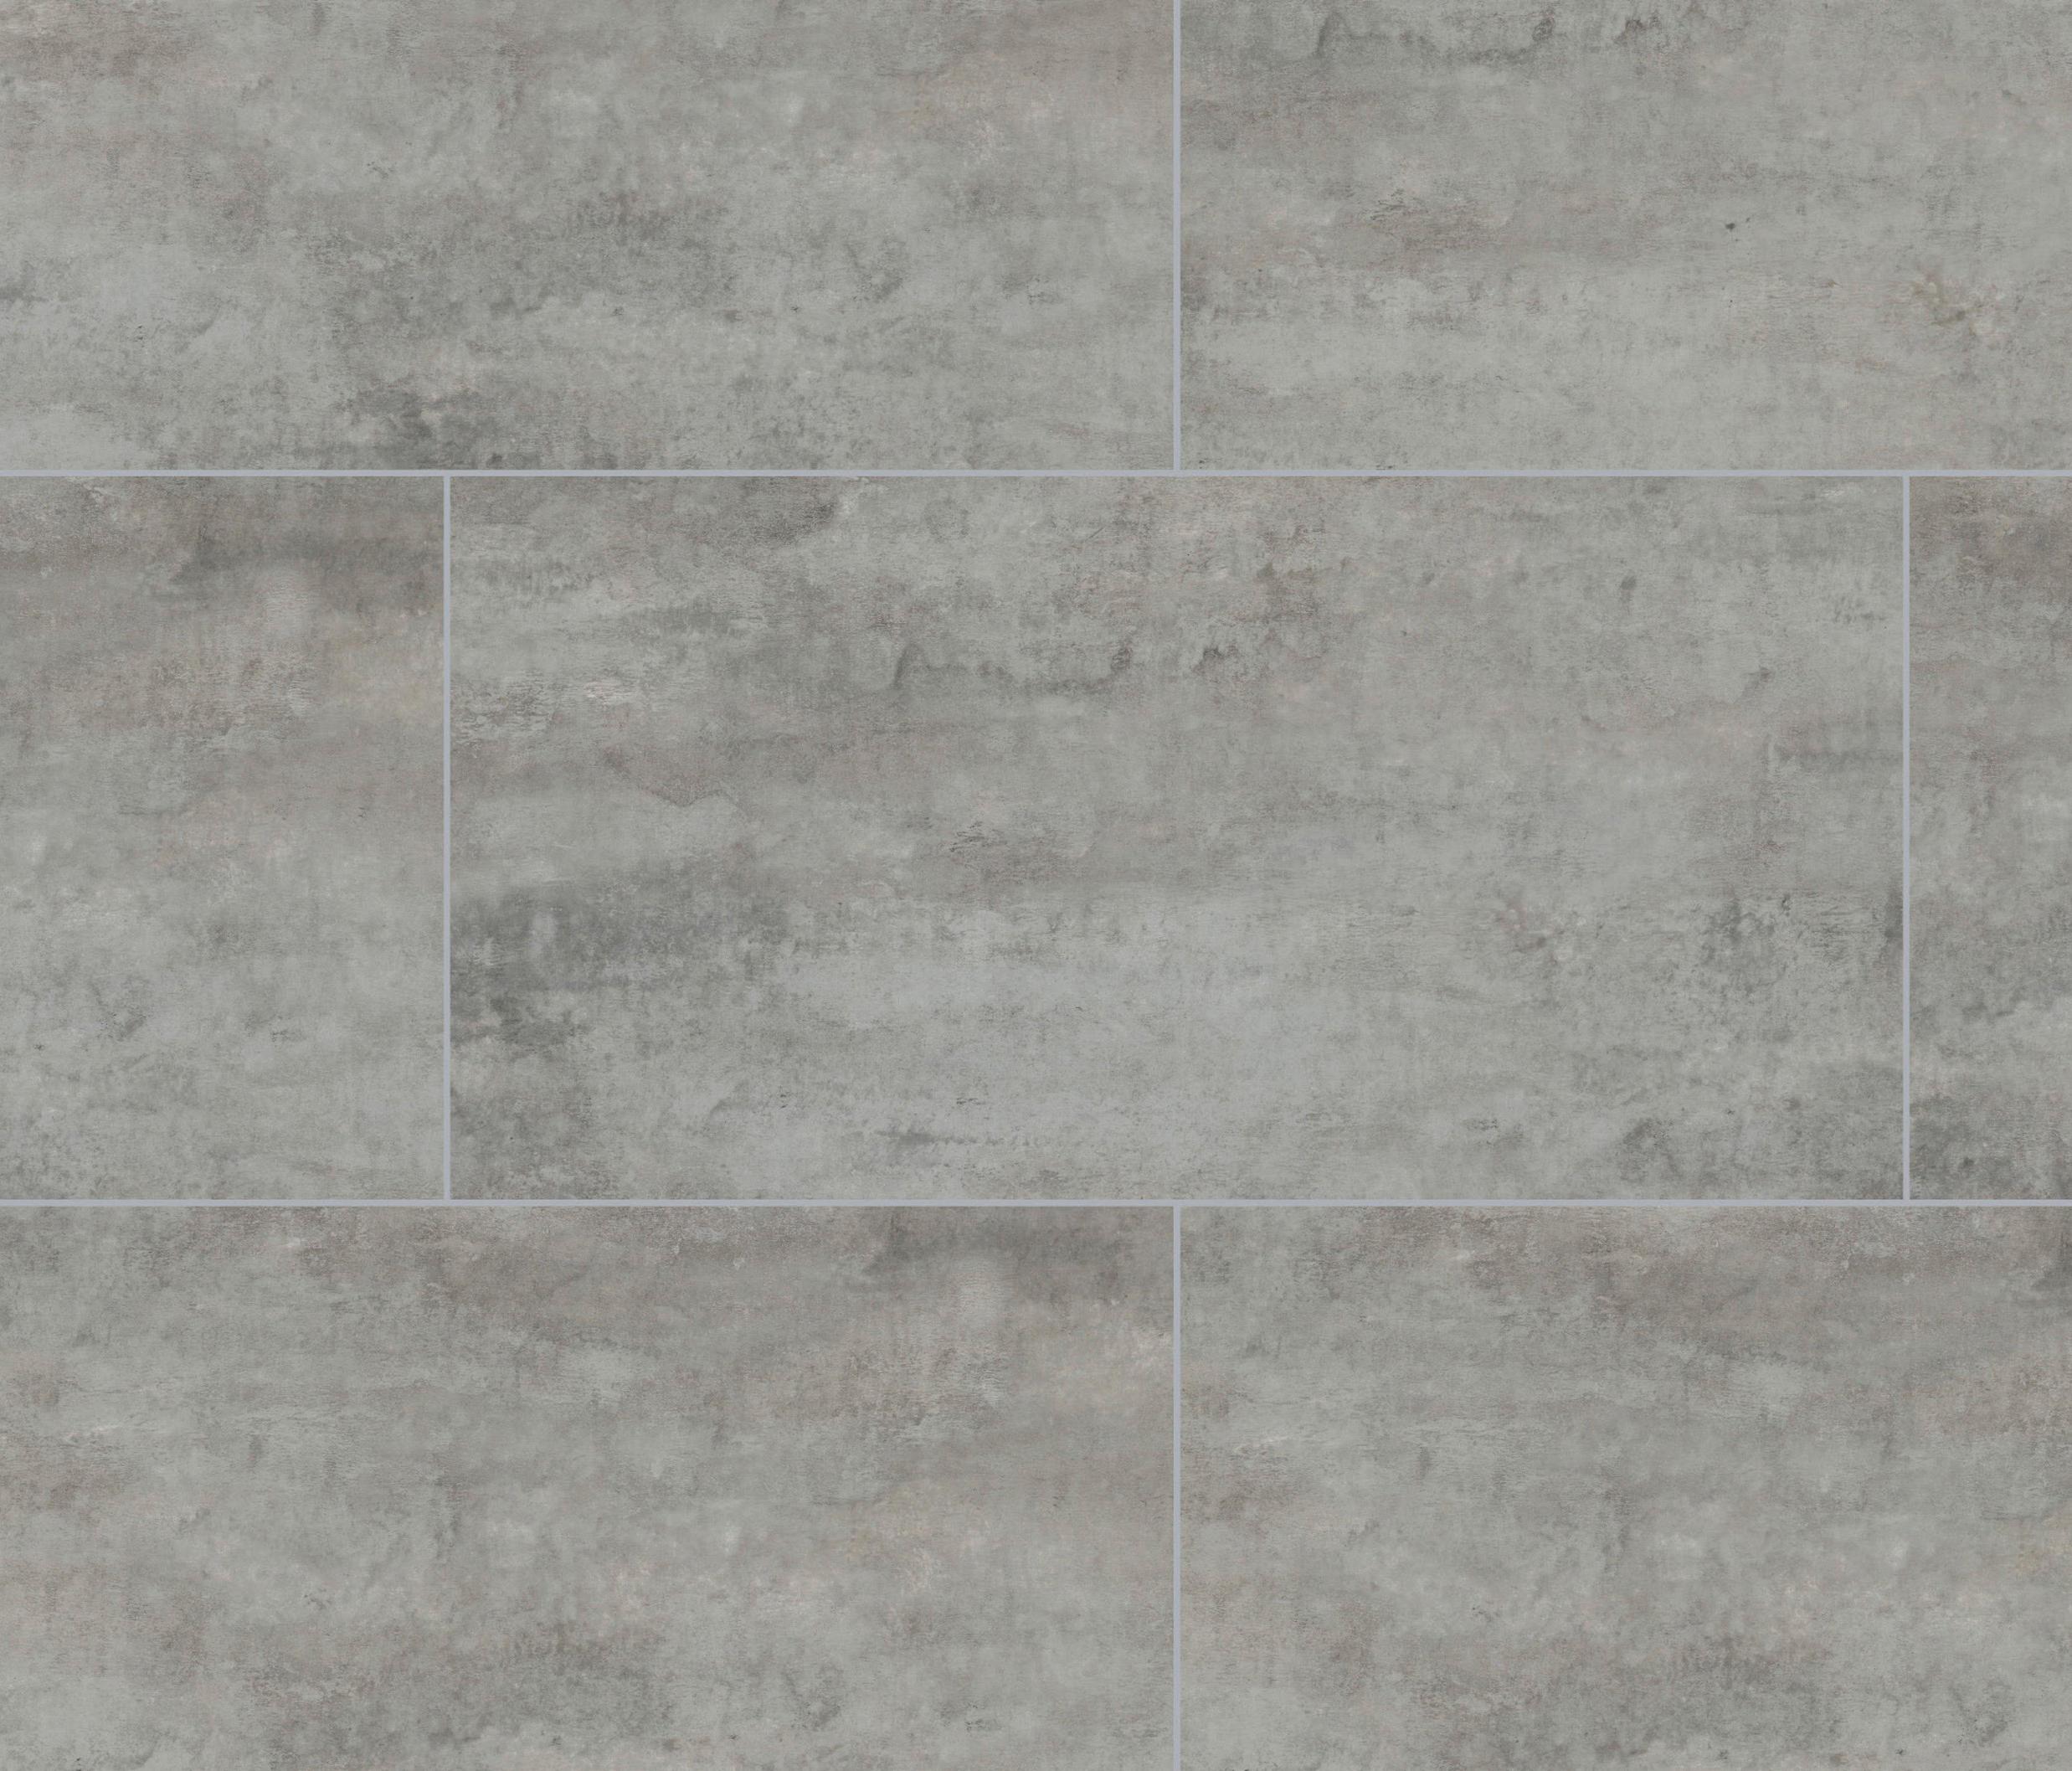 floors home 30 tr 720 kunststoff fliesen von project. Black Bedroom Furniture Sets. Home Design Ideas